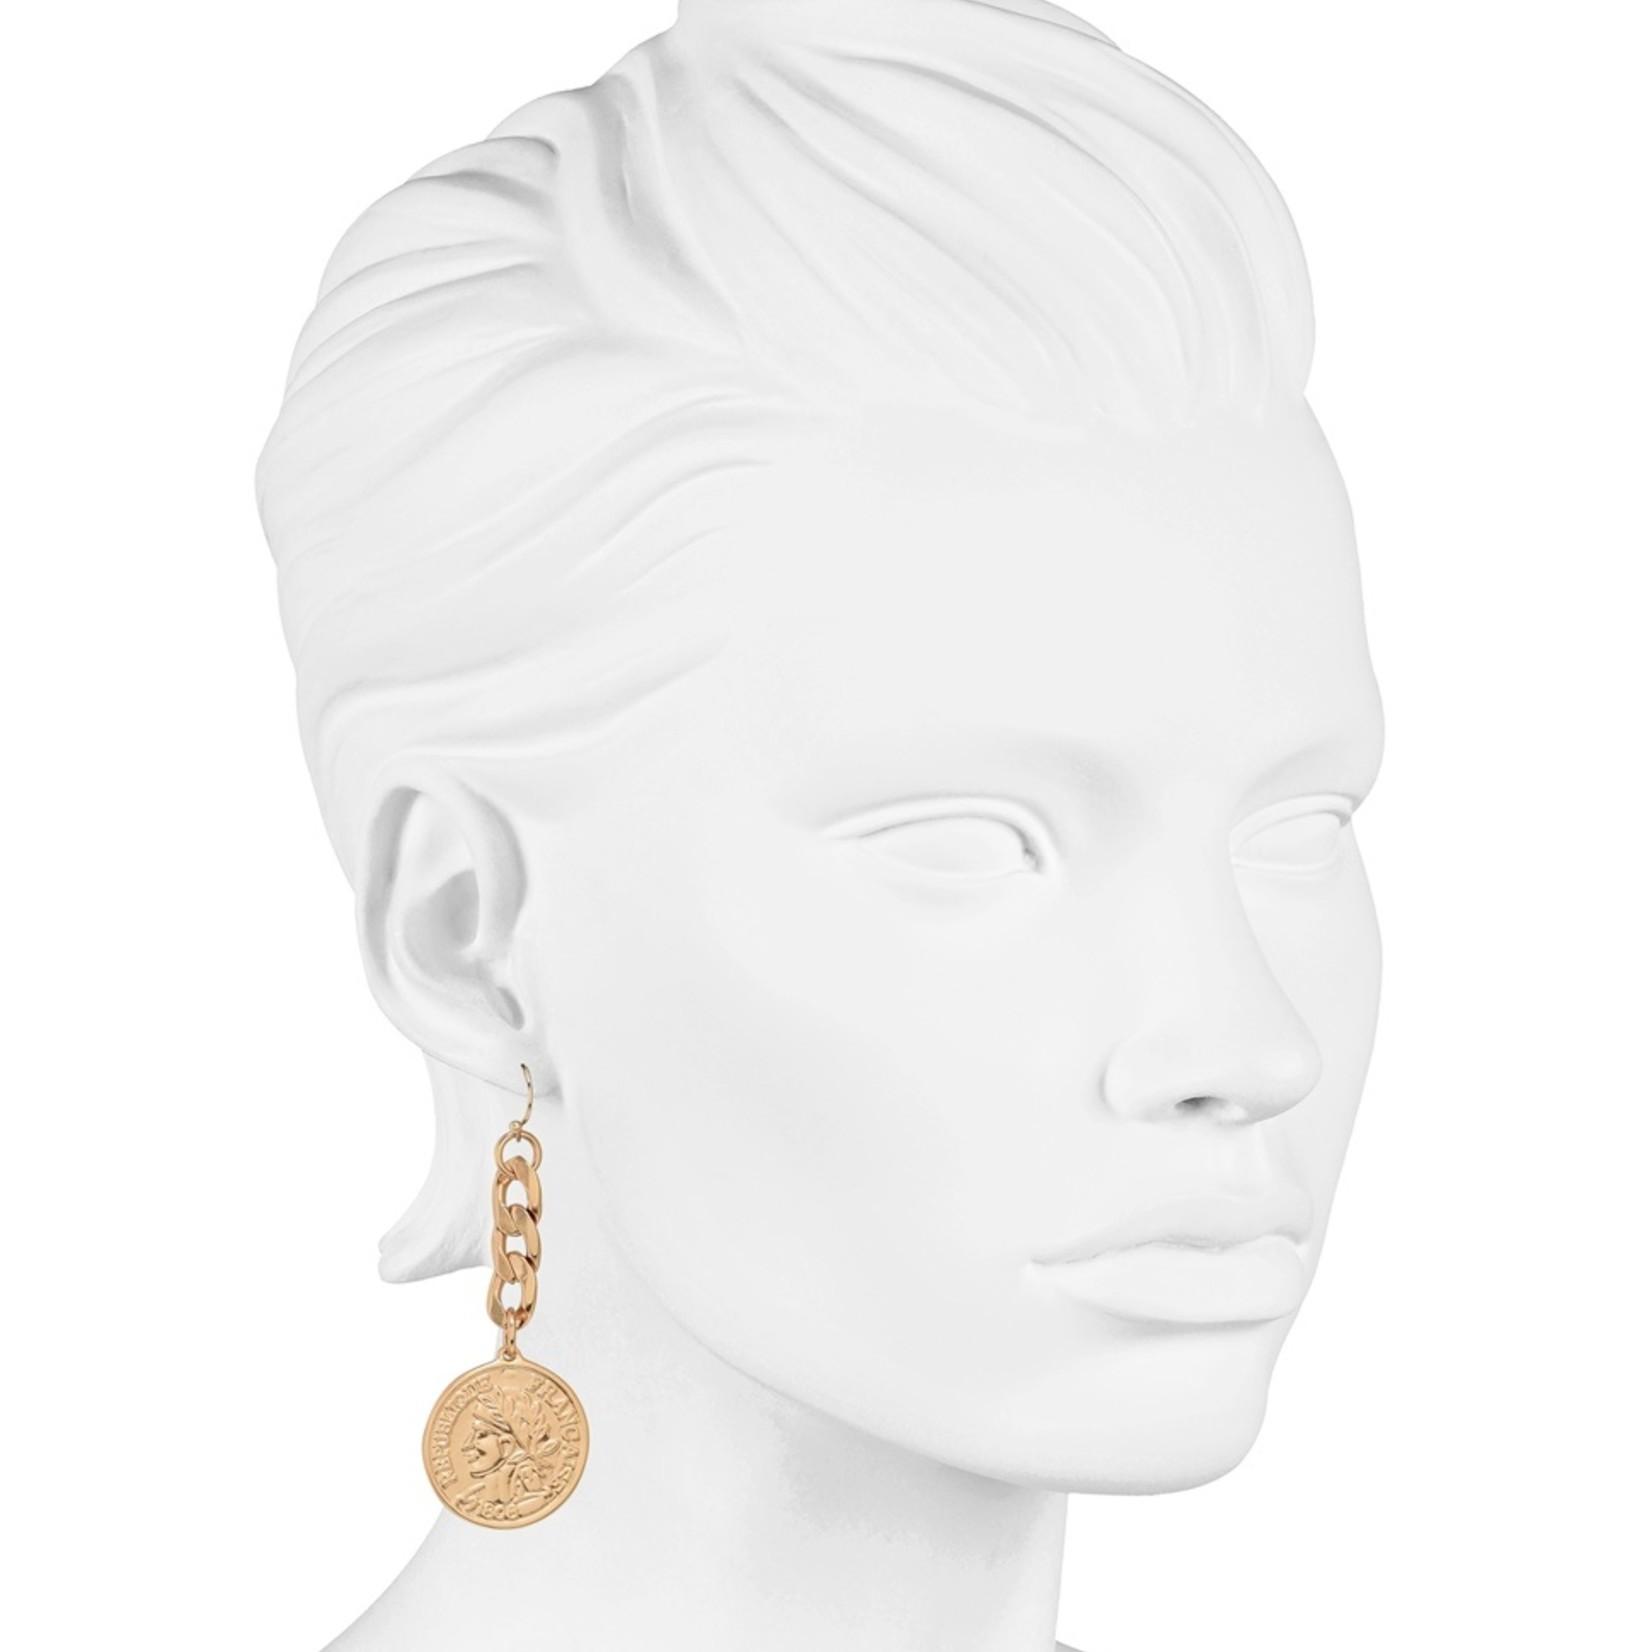 Piemonte oorbellen goudkleurig met ketting en munt